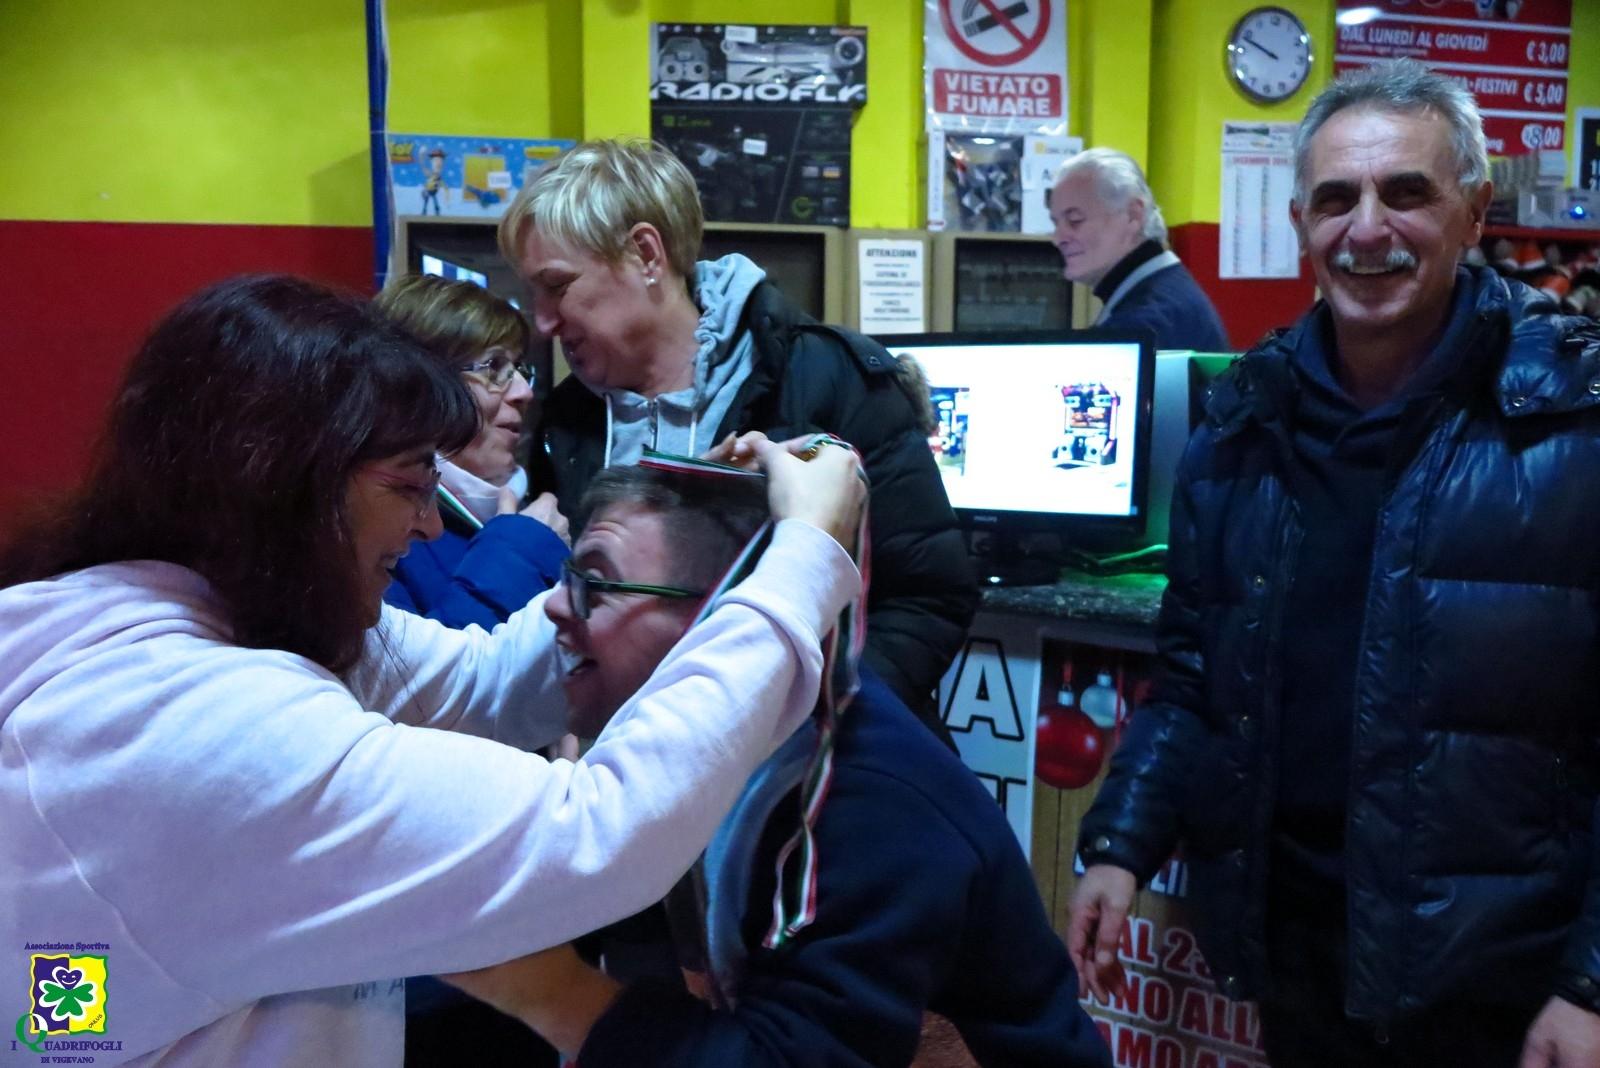 Torneo Bowling Vigevano 19-12-2018 - 086